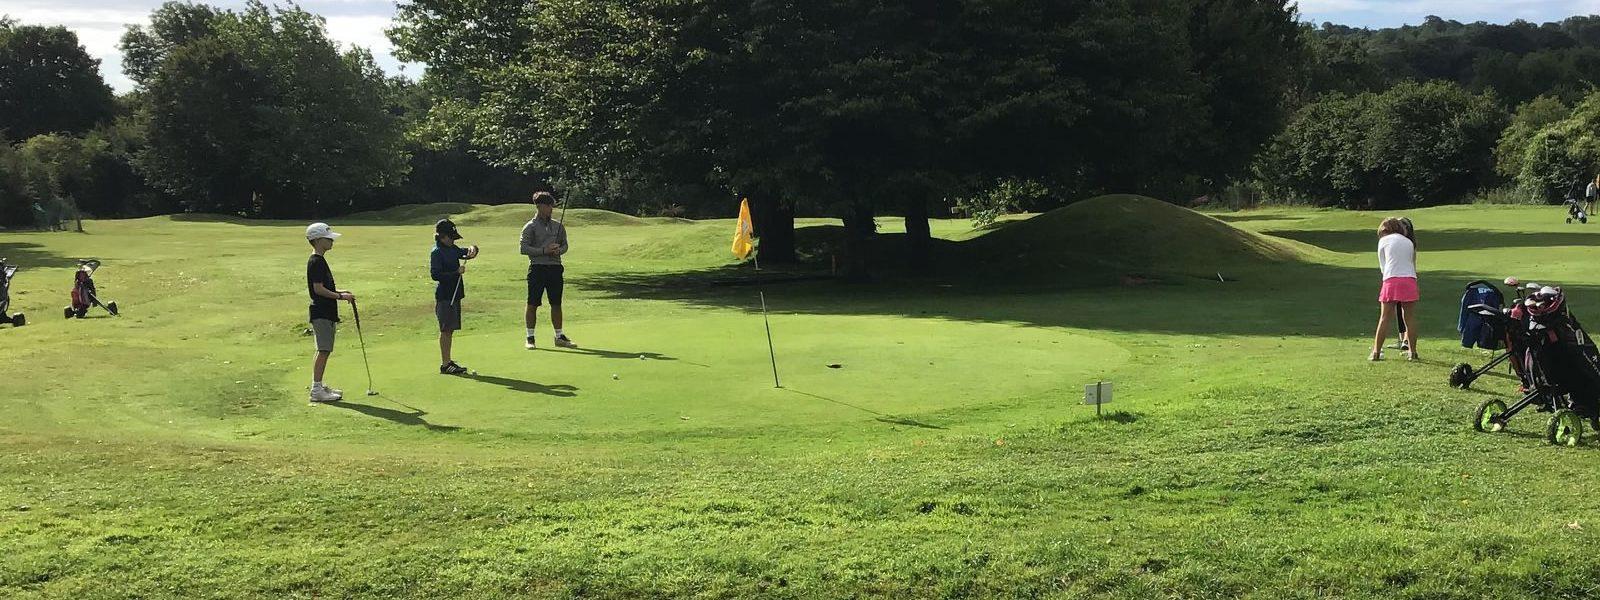 Cayman Golf Pitch and Putt 18 Hole Short Course Brixham Devon